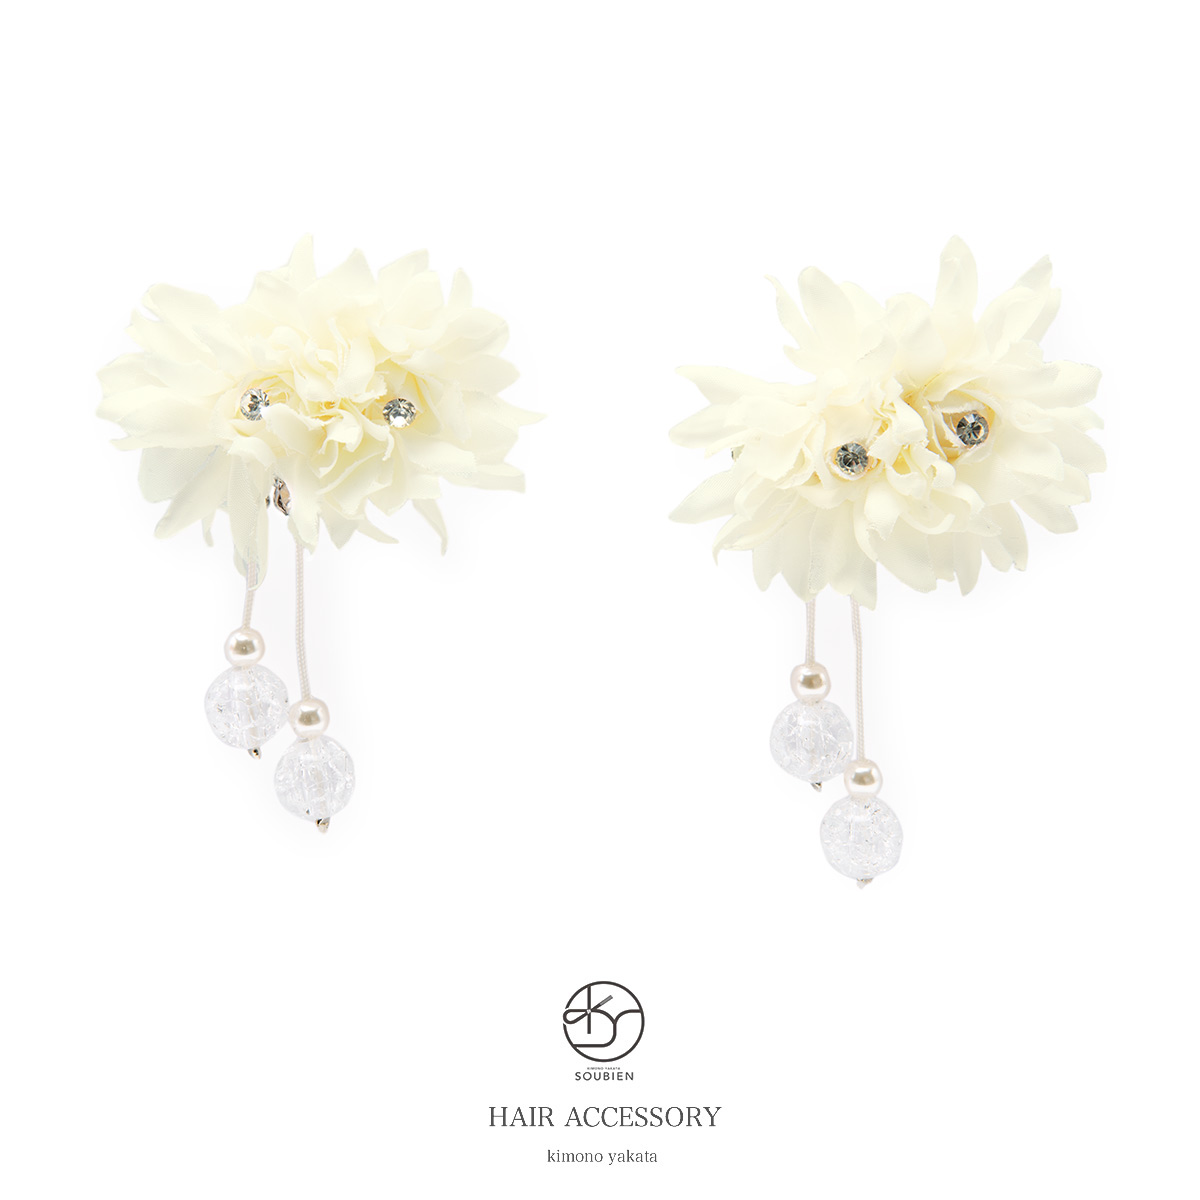 79a655ee2 Small ornament 2 sets for yukata flowers flower white Bijou cleaves bra  bands summer kimono kids ...